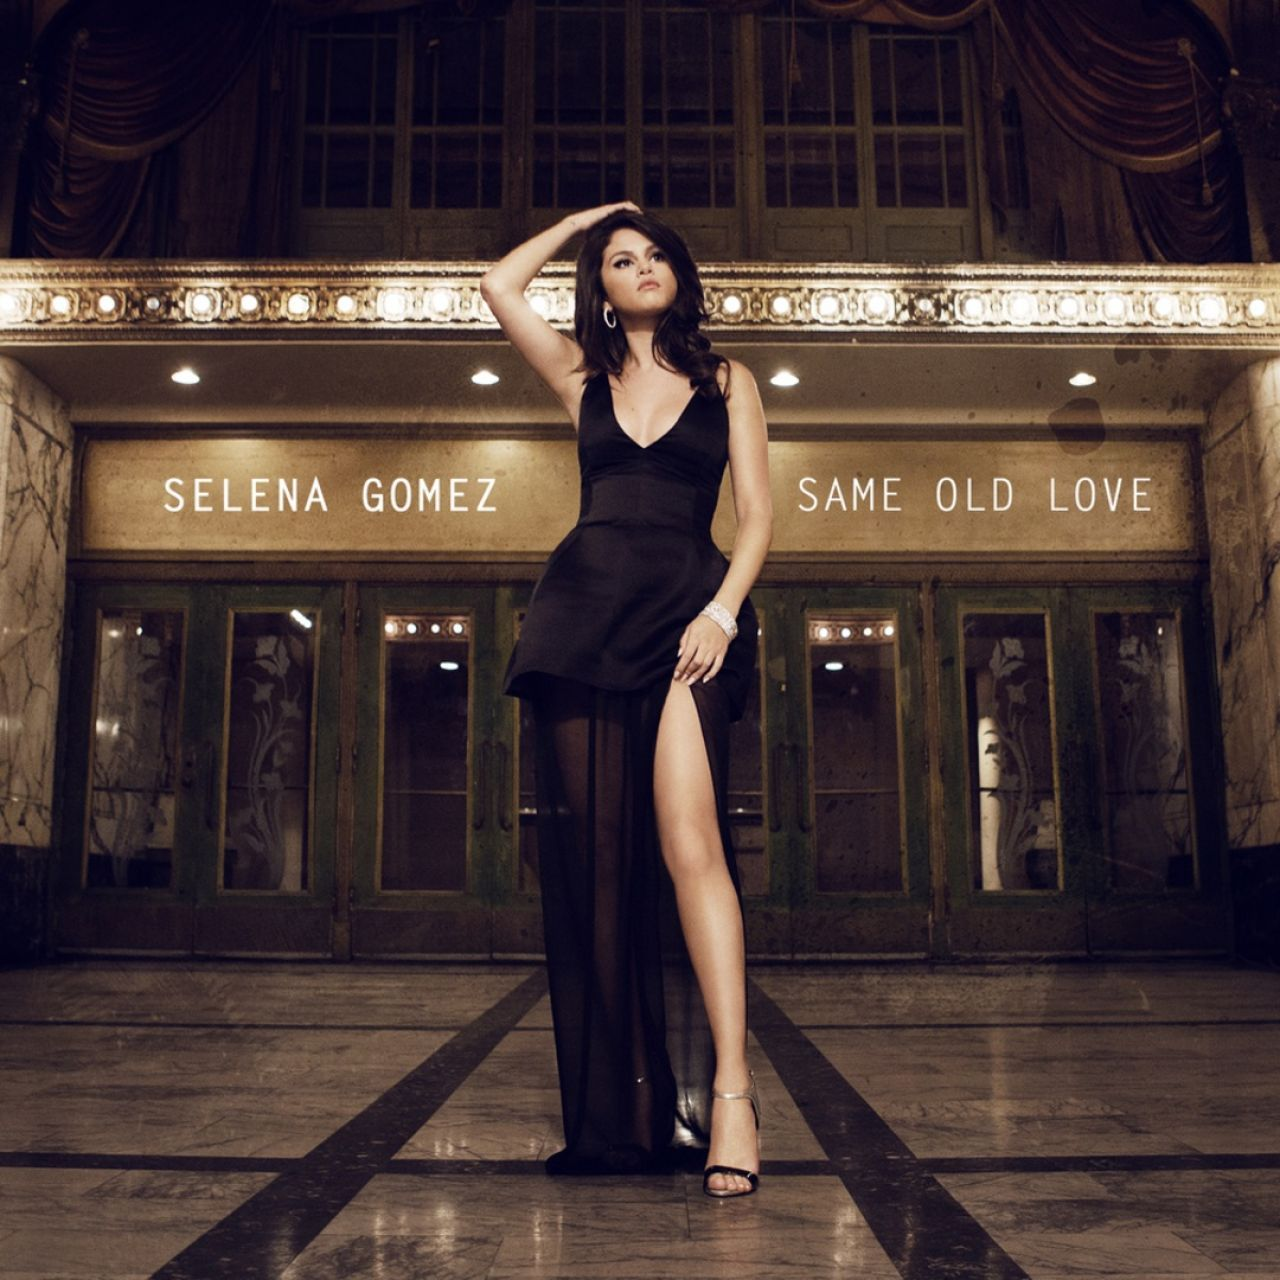 Selena Gomez - Revival Photoshoot (2015)